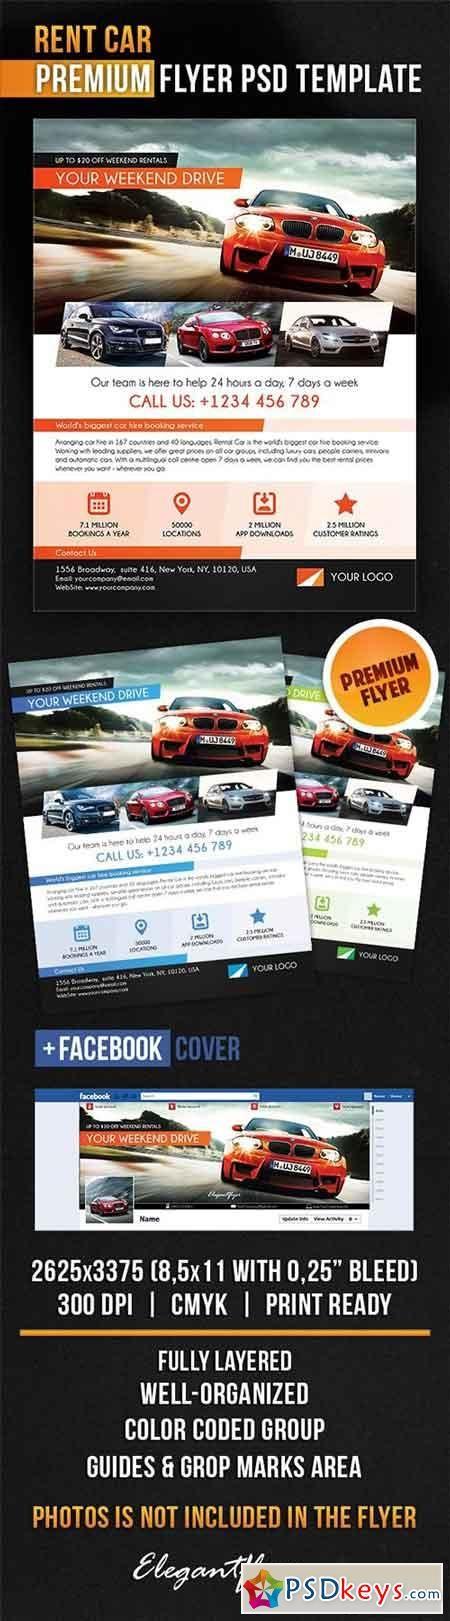 Rent Car Flyer PSD Template + Facebook Cover